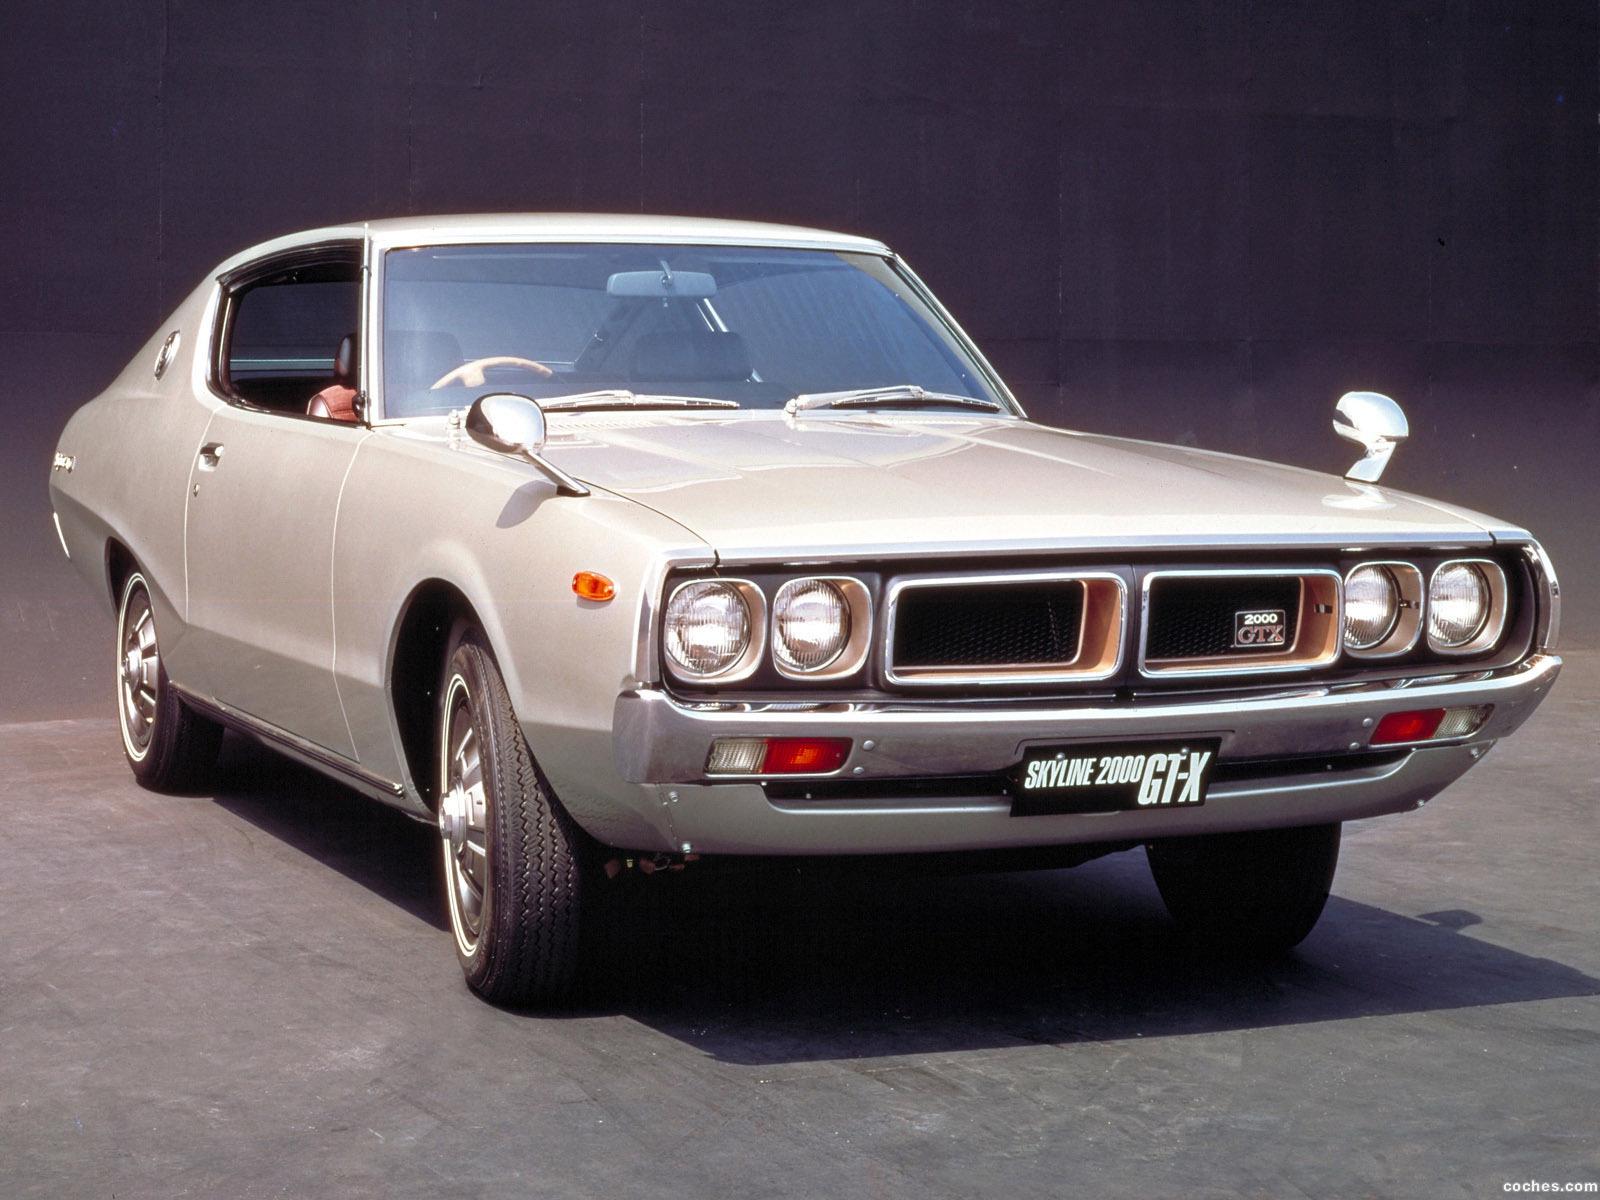 Foto 0 de Nissan Skyline 2000 GT X C110 1972